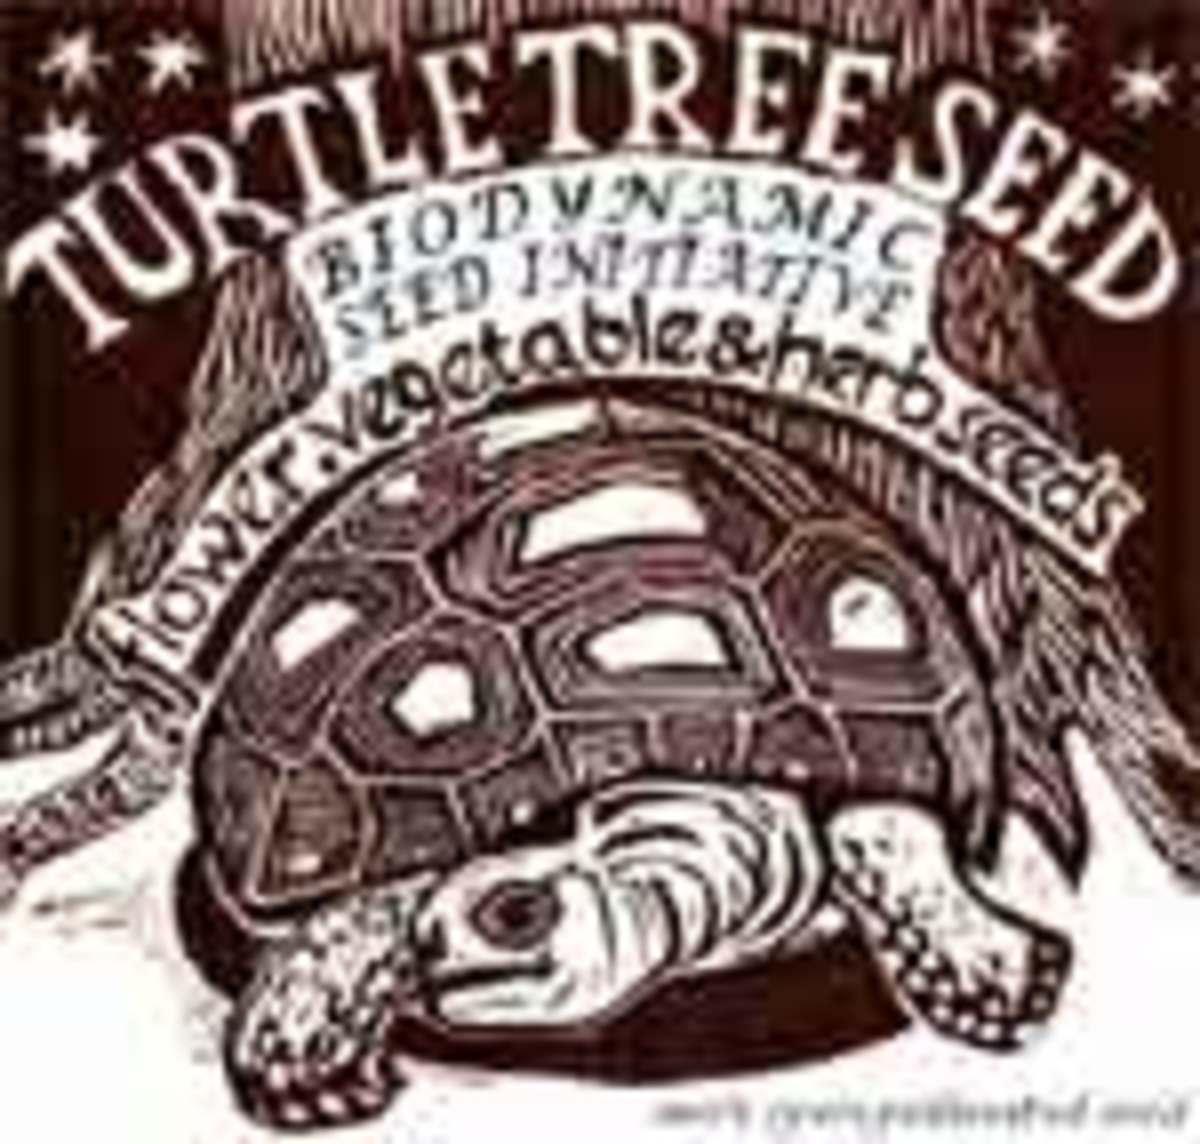 turtletree